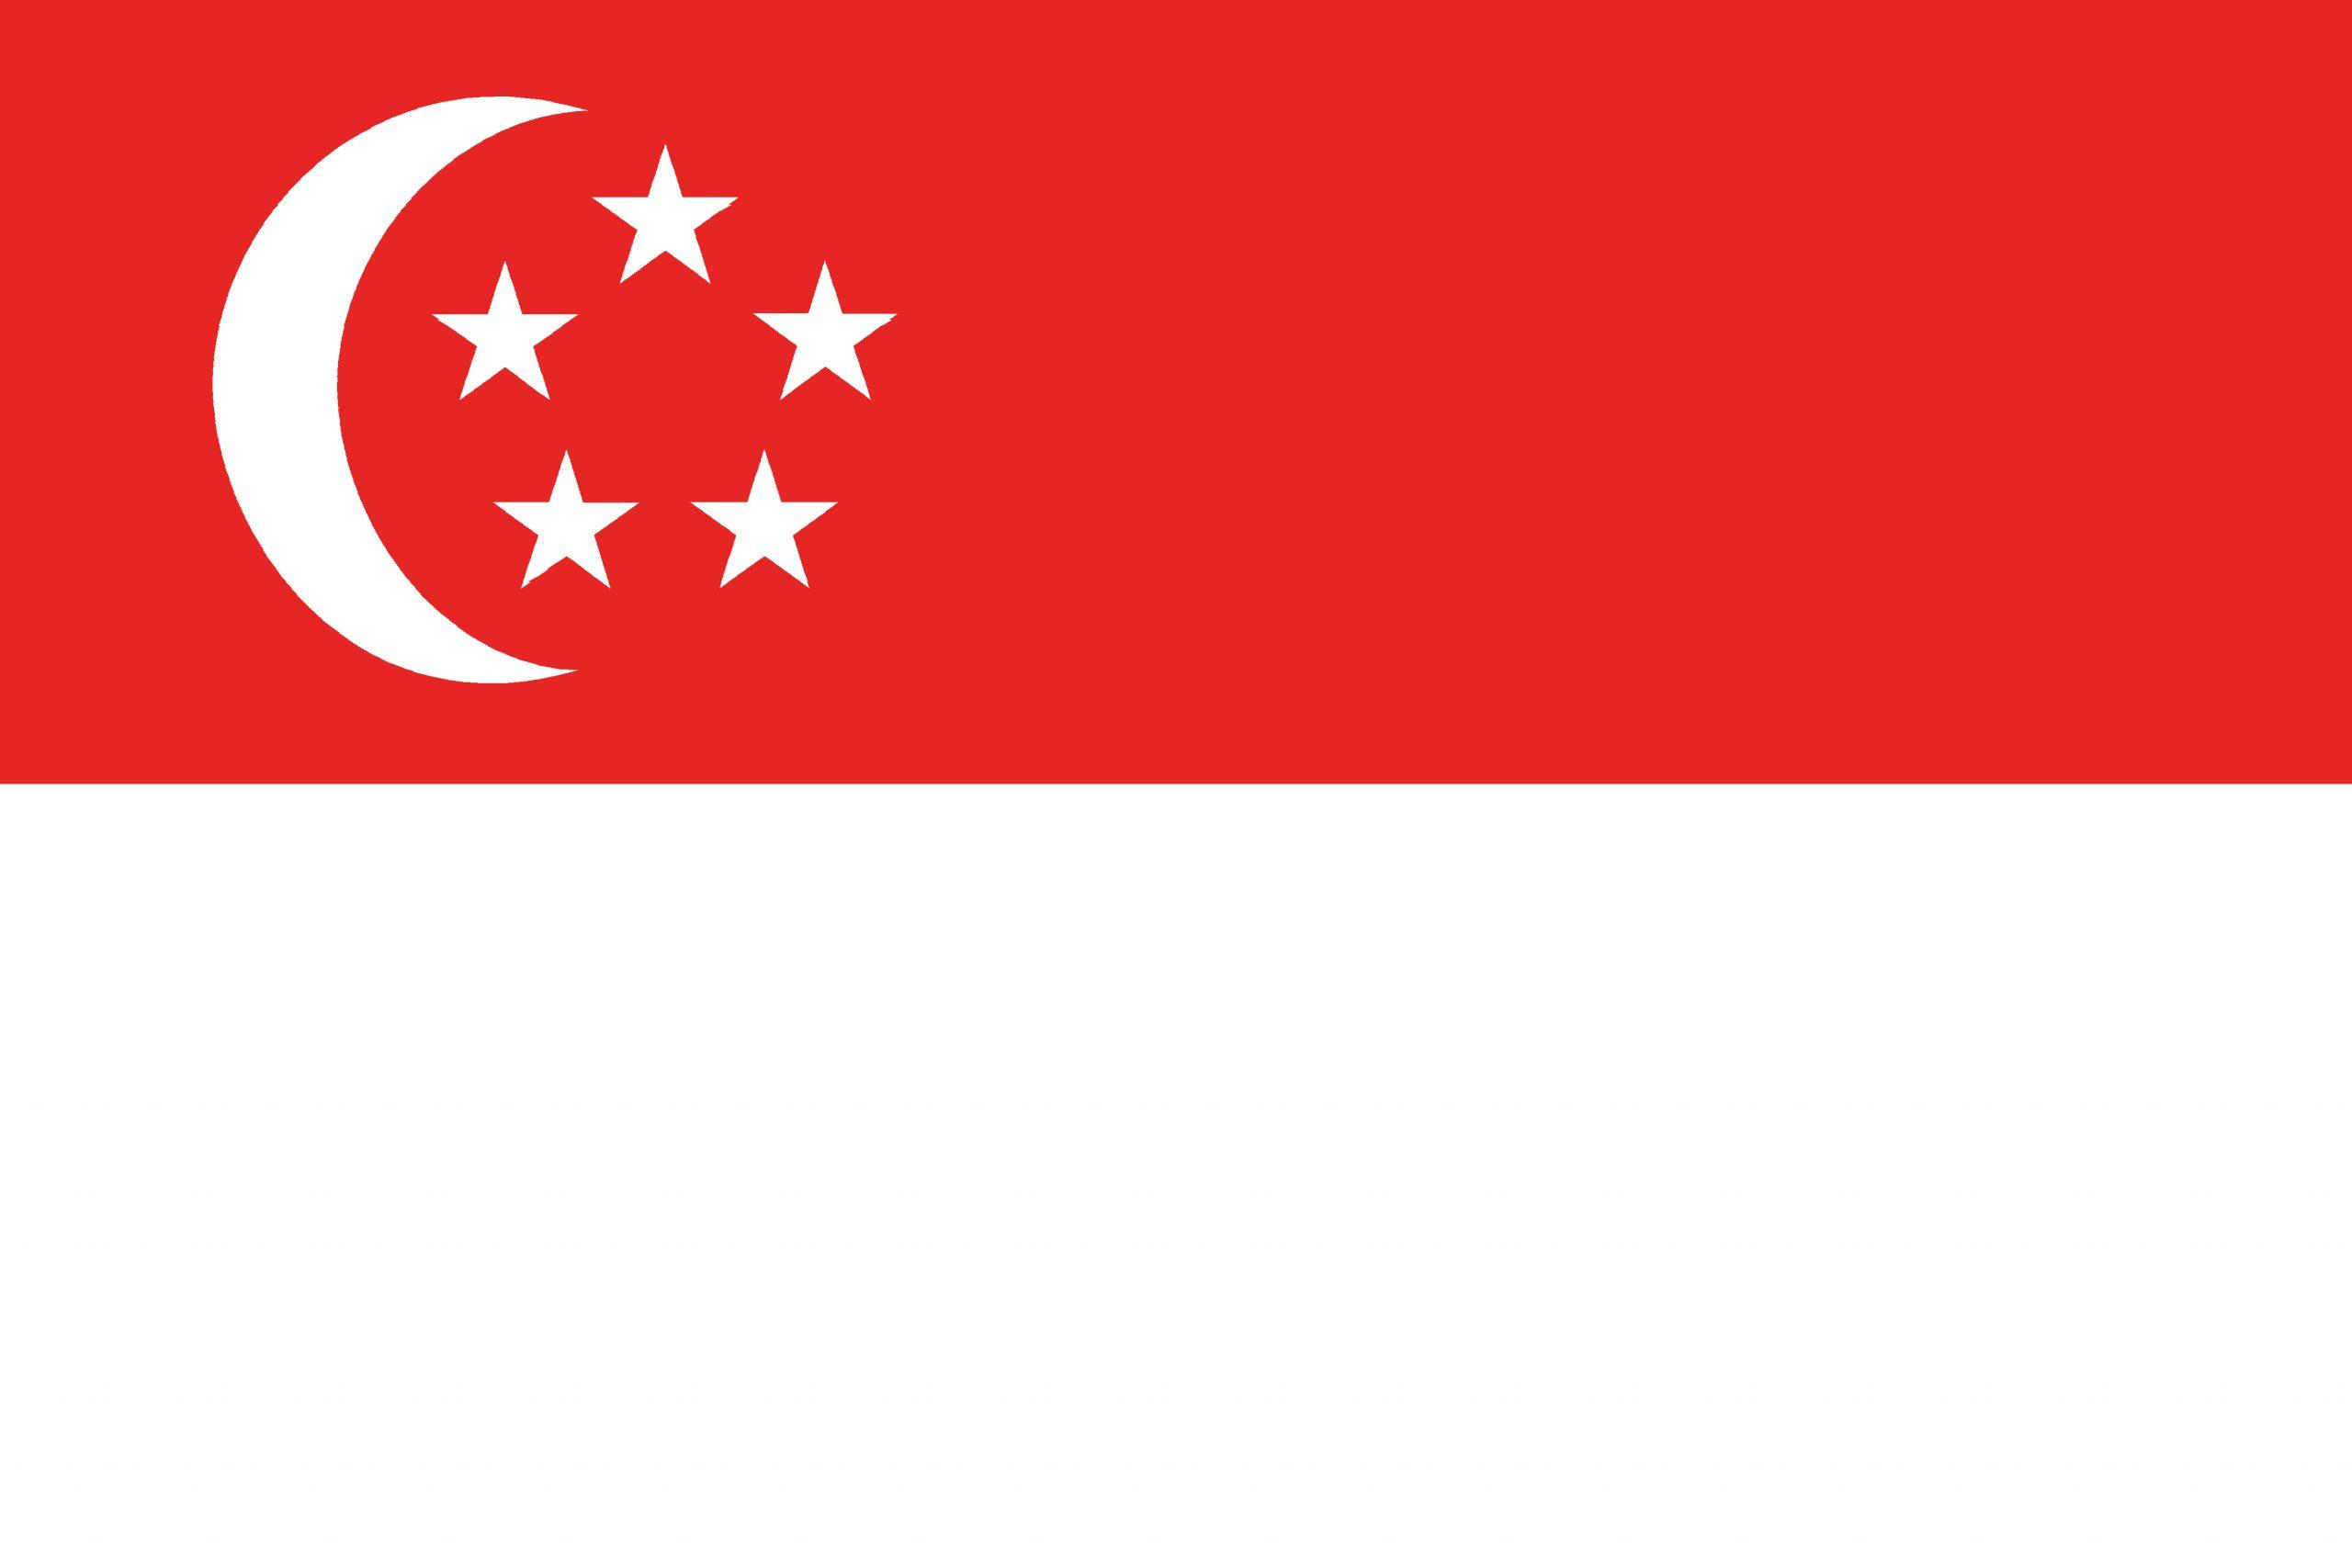 Singapore national, flag, sewn, national, flag, cheap, online